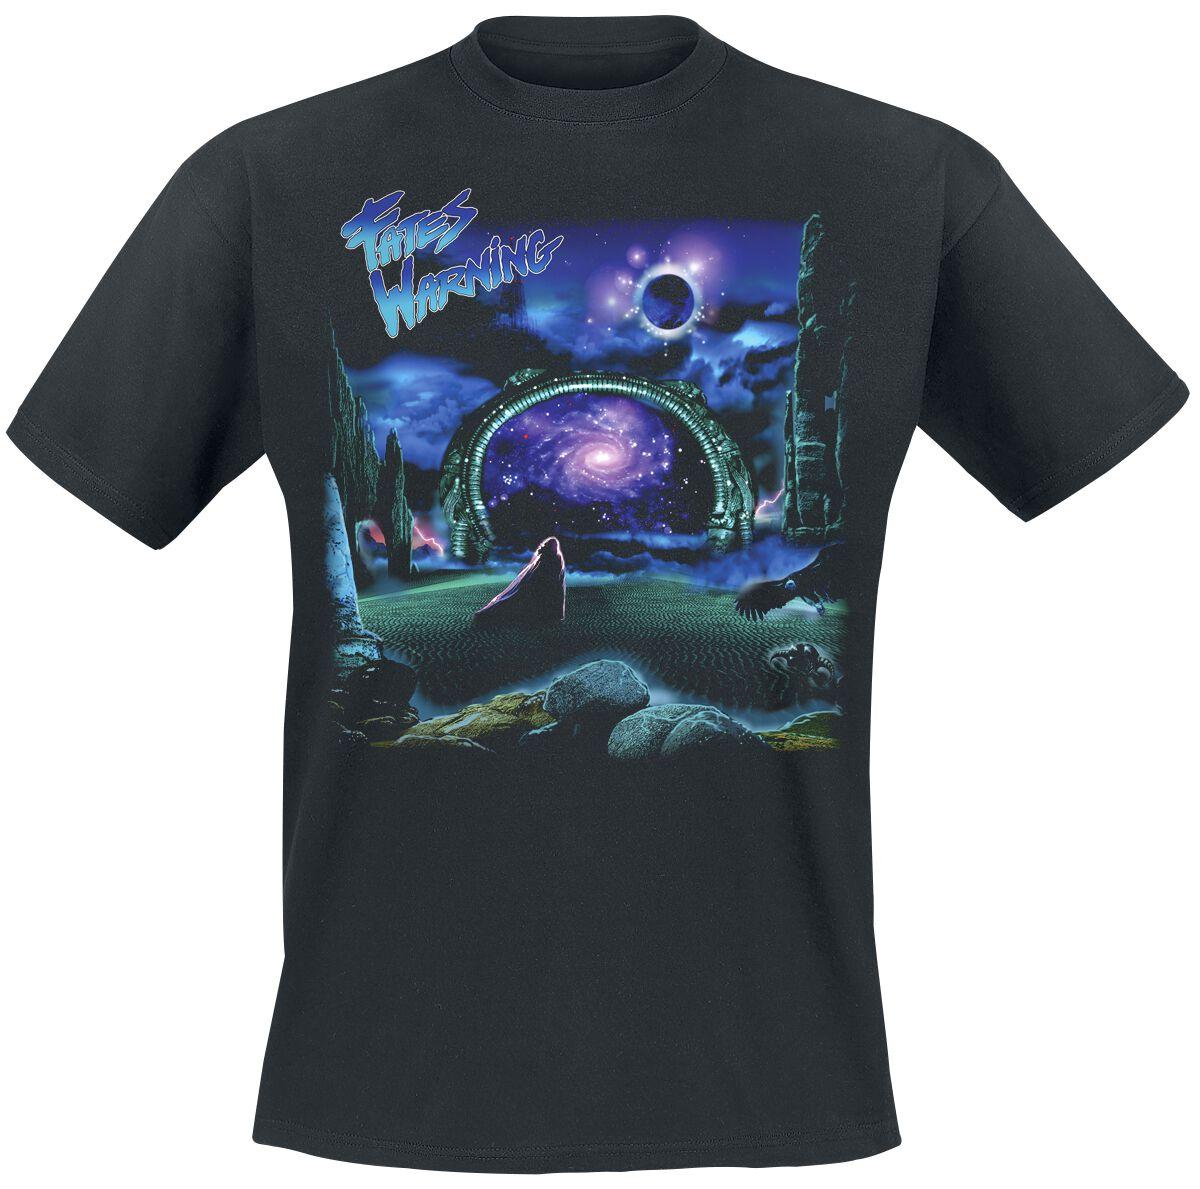 Zespoły - Koszulki - T-Shirt Fates Warning Awaken the guardian - Live T-Shirt czarny - 354500